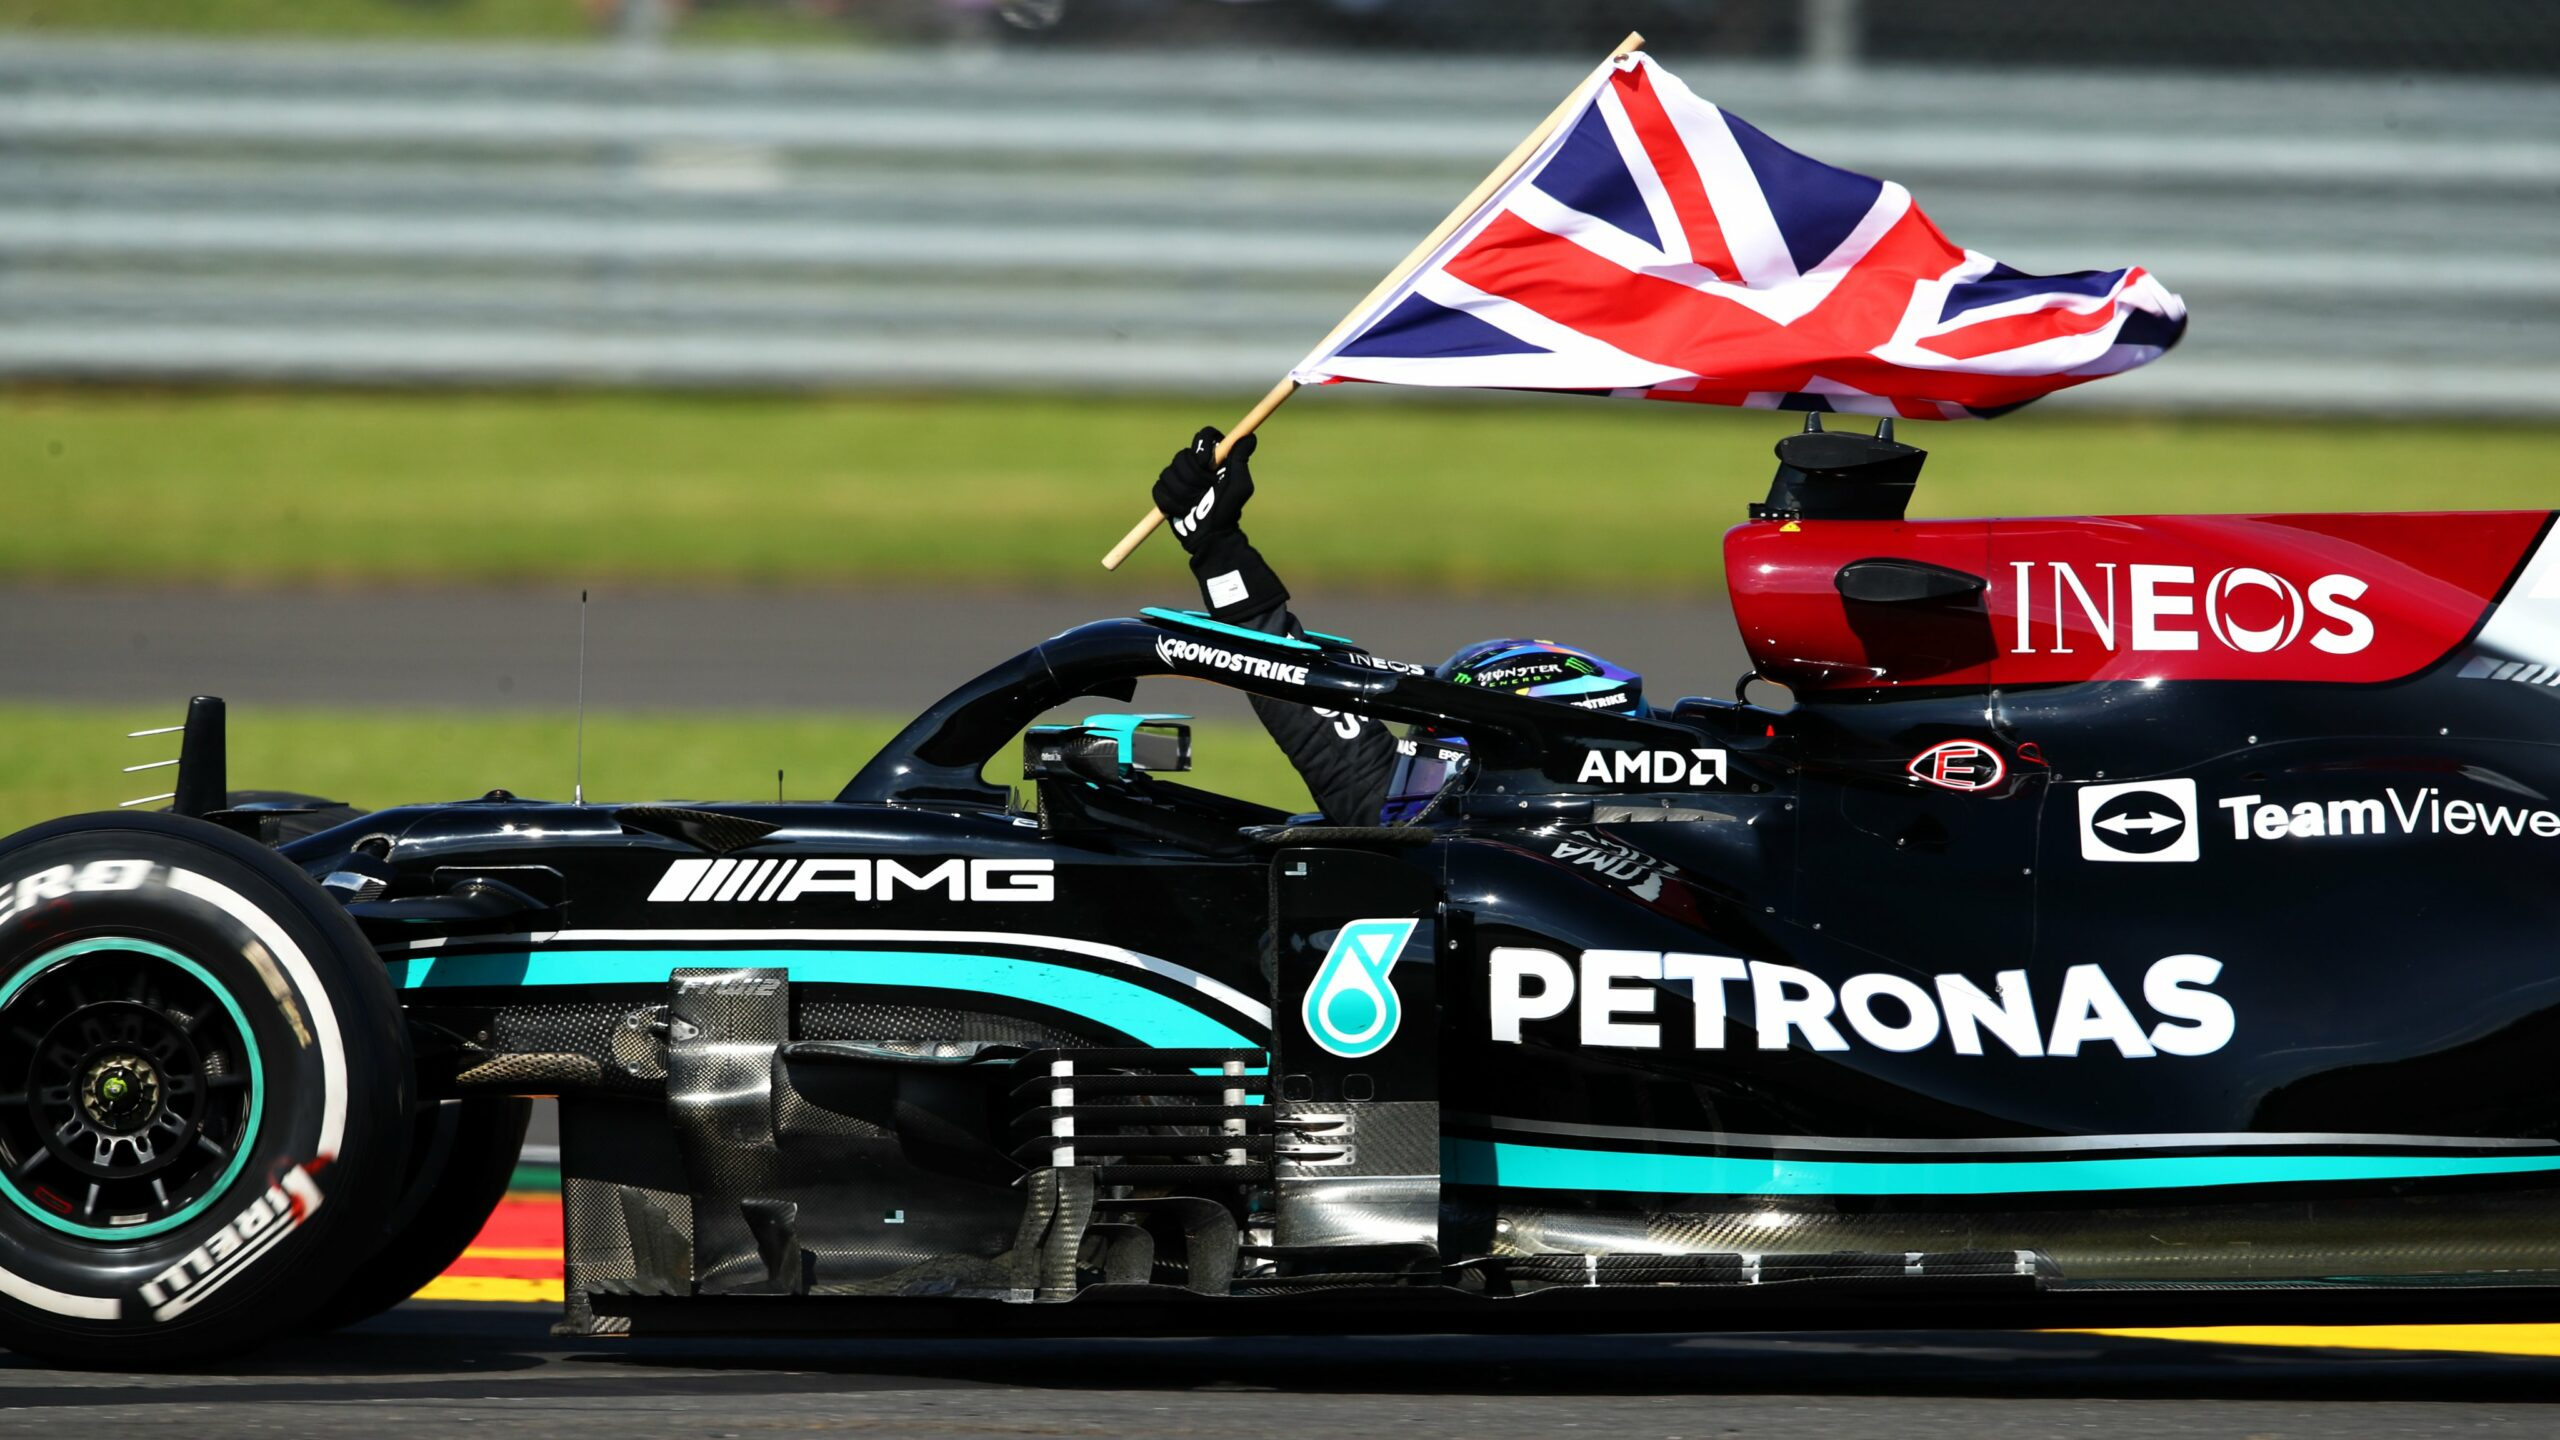 F1 - Les résultats définitifs du Grand Prix de Grande-Bretagne 2021